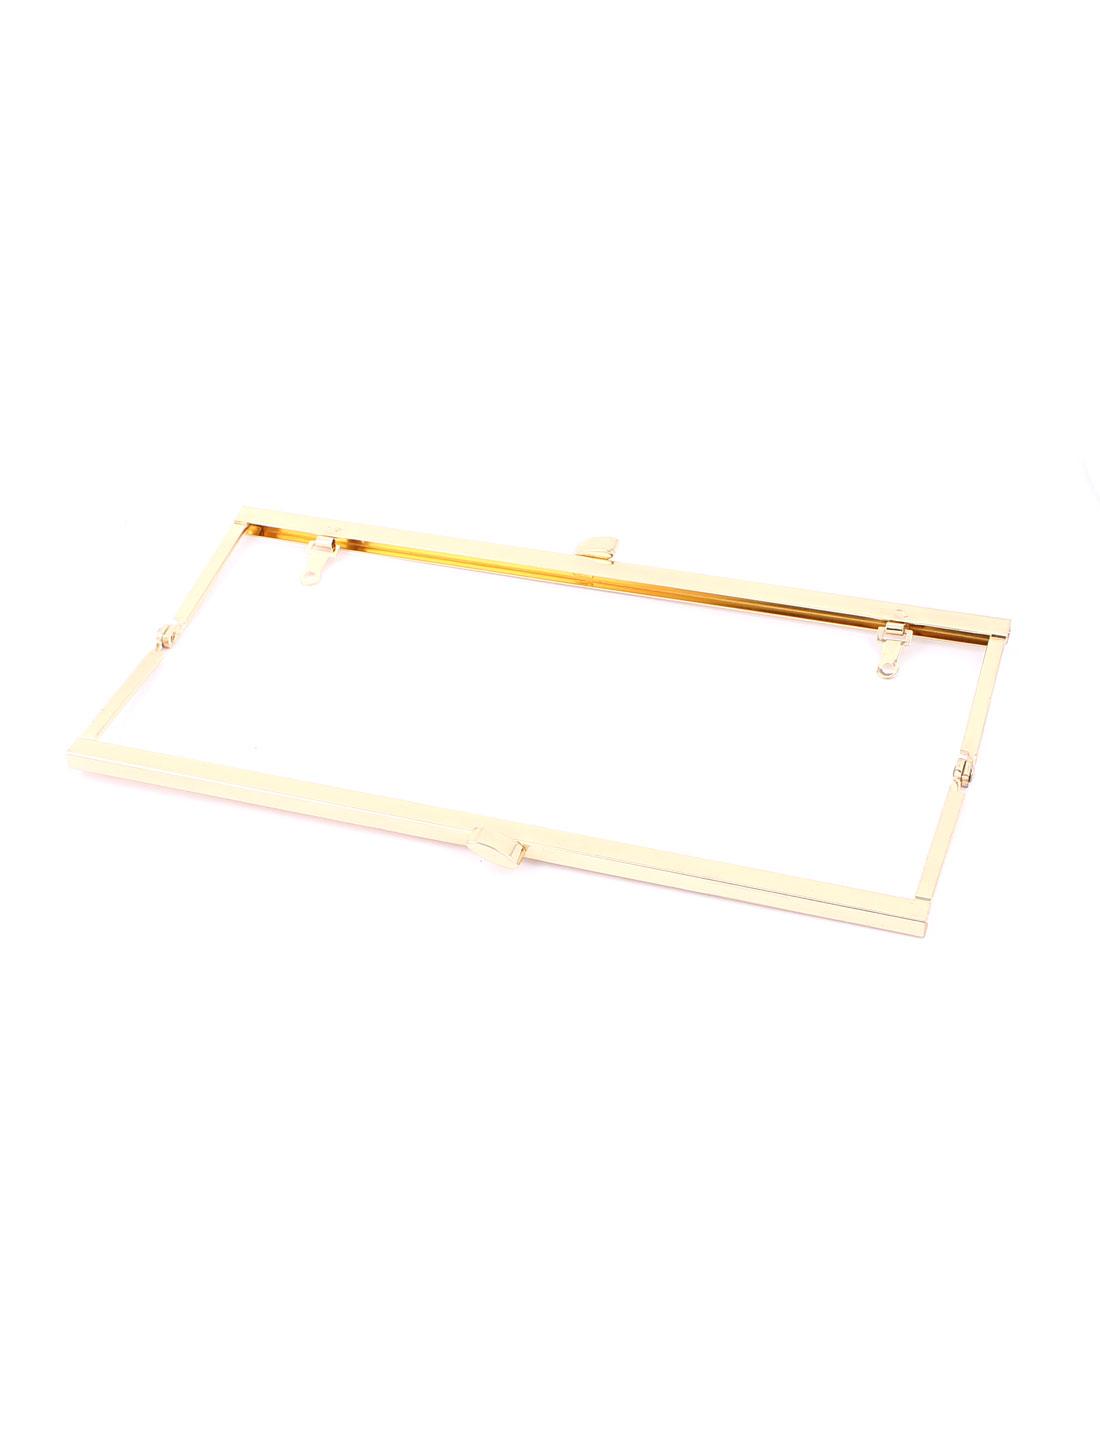 Metal Arch Style Kisslock Purse Handbag Clasp Frame Gold Tone